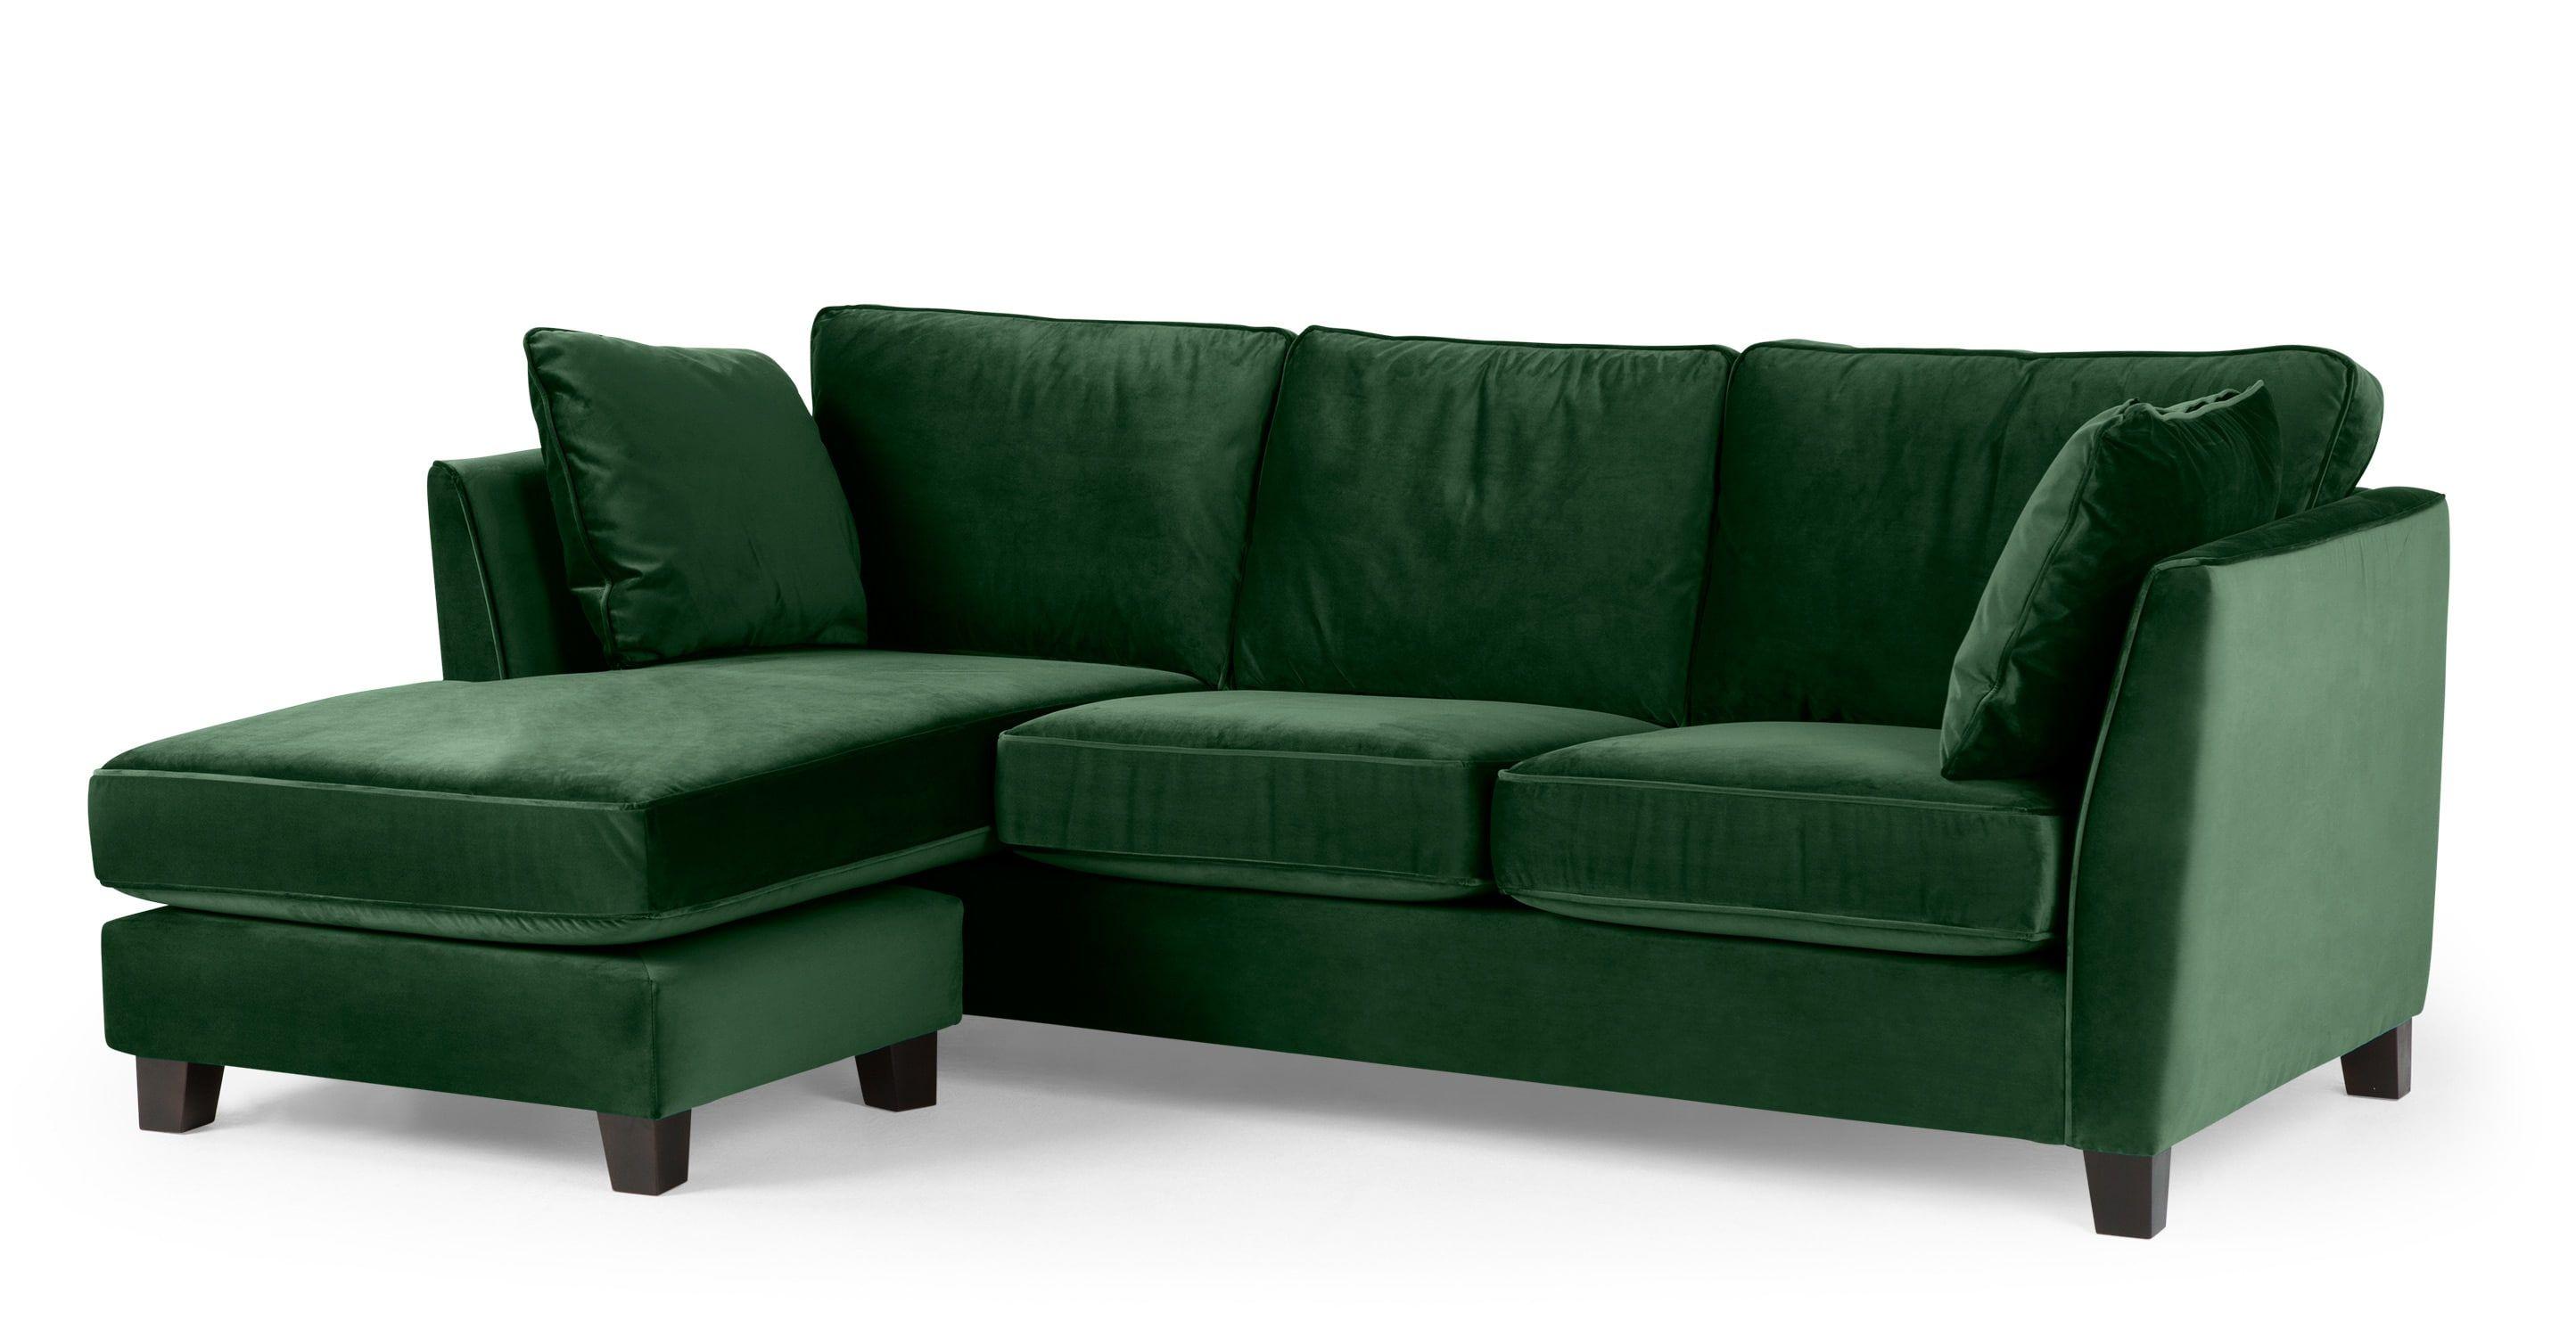 Wolseley Large Canape D Angle Velours Vert Foret Sofa Bed Green Corner Sofa Sofa Inspiration